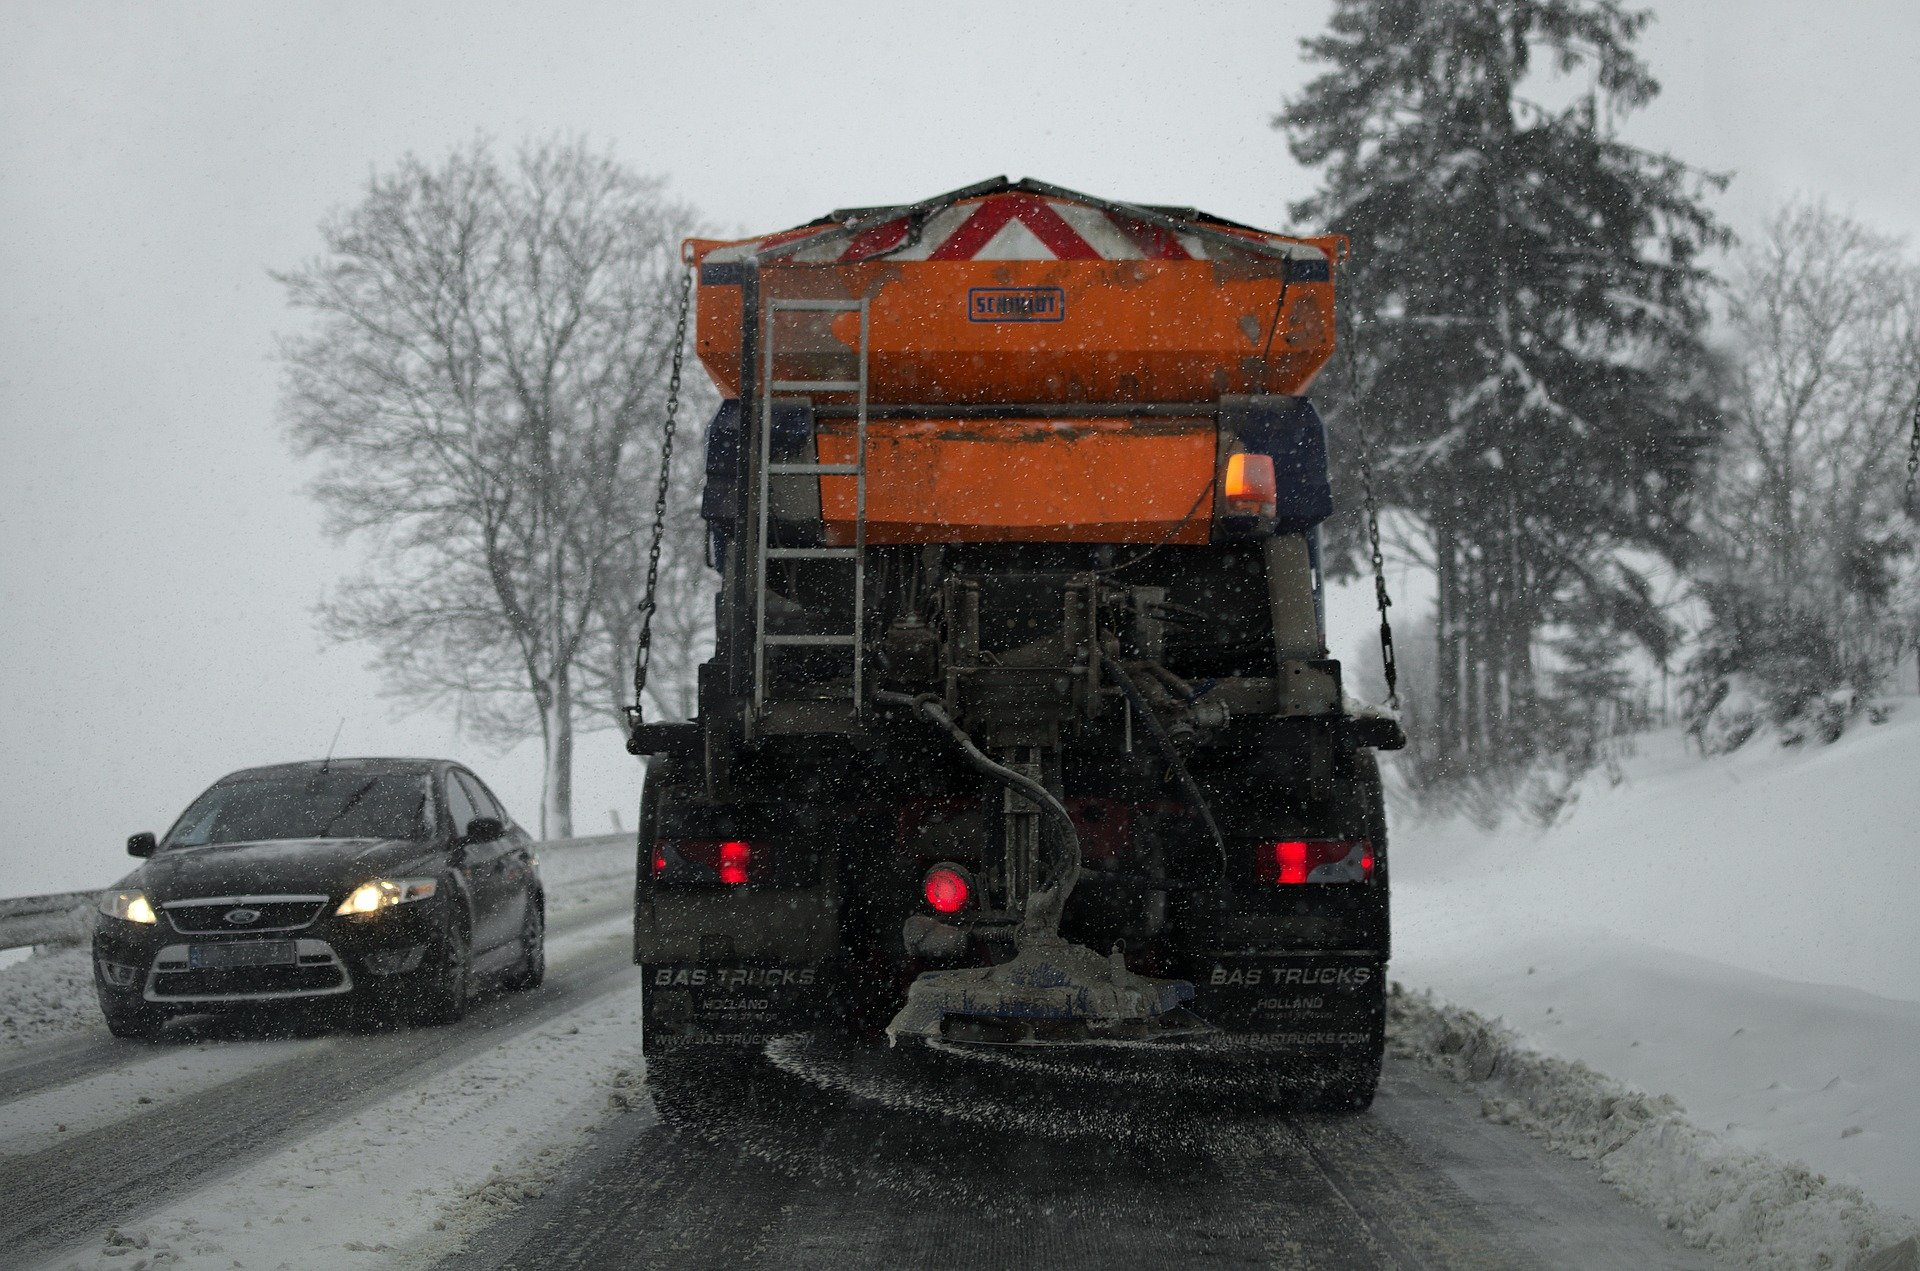 Lancaster deicing truck